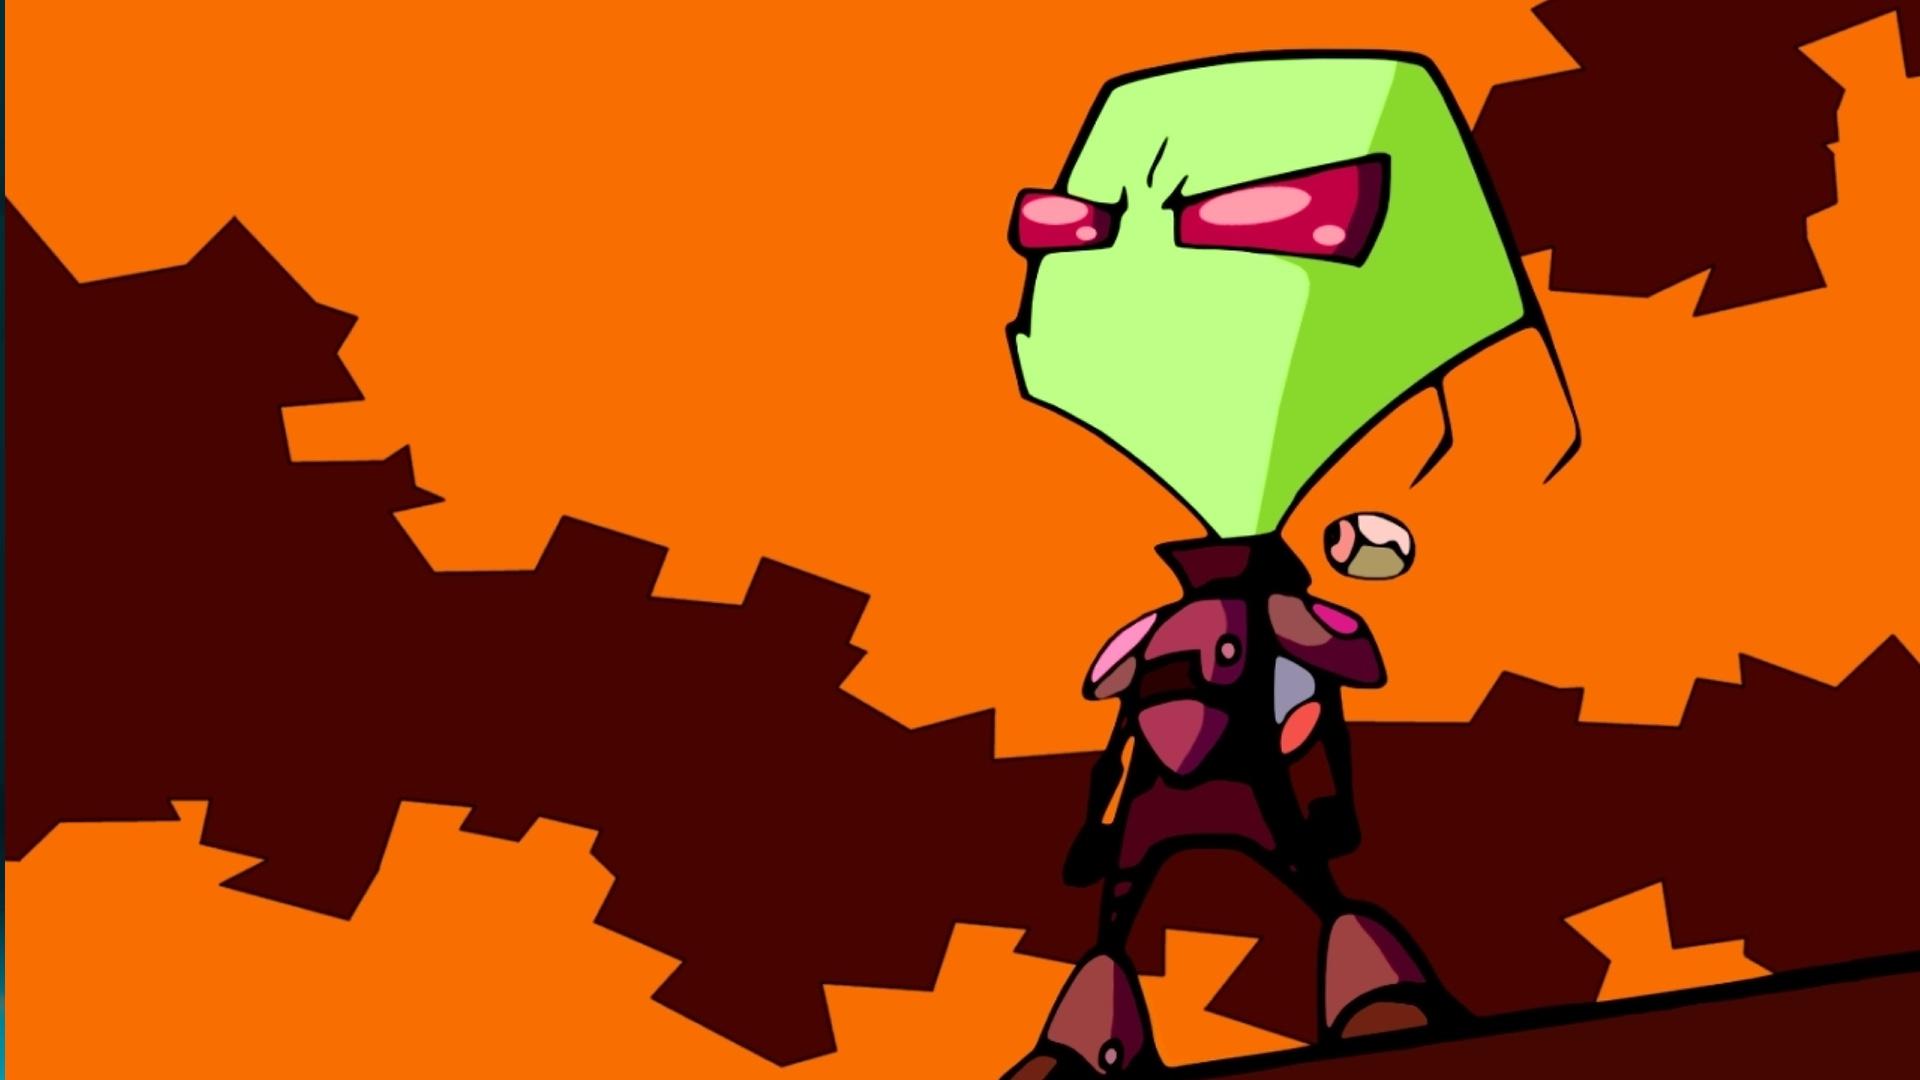 Animated Halloween Desktop Wallpaper Nickelodeon Is Developing An Invader Zim Animated Movie